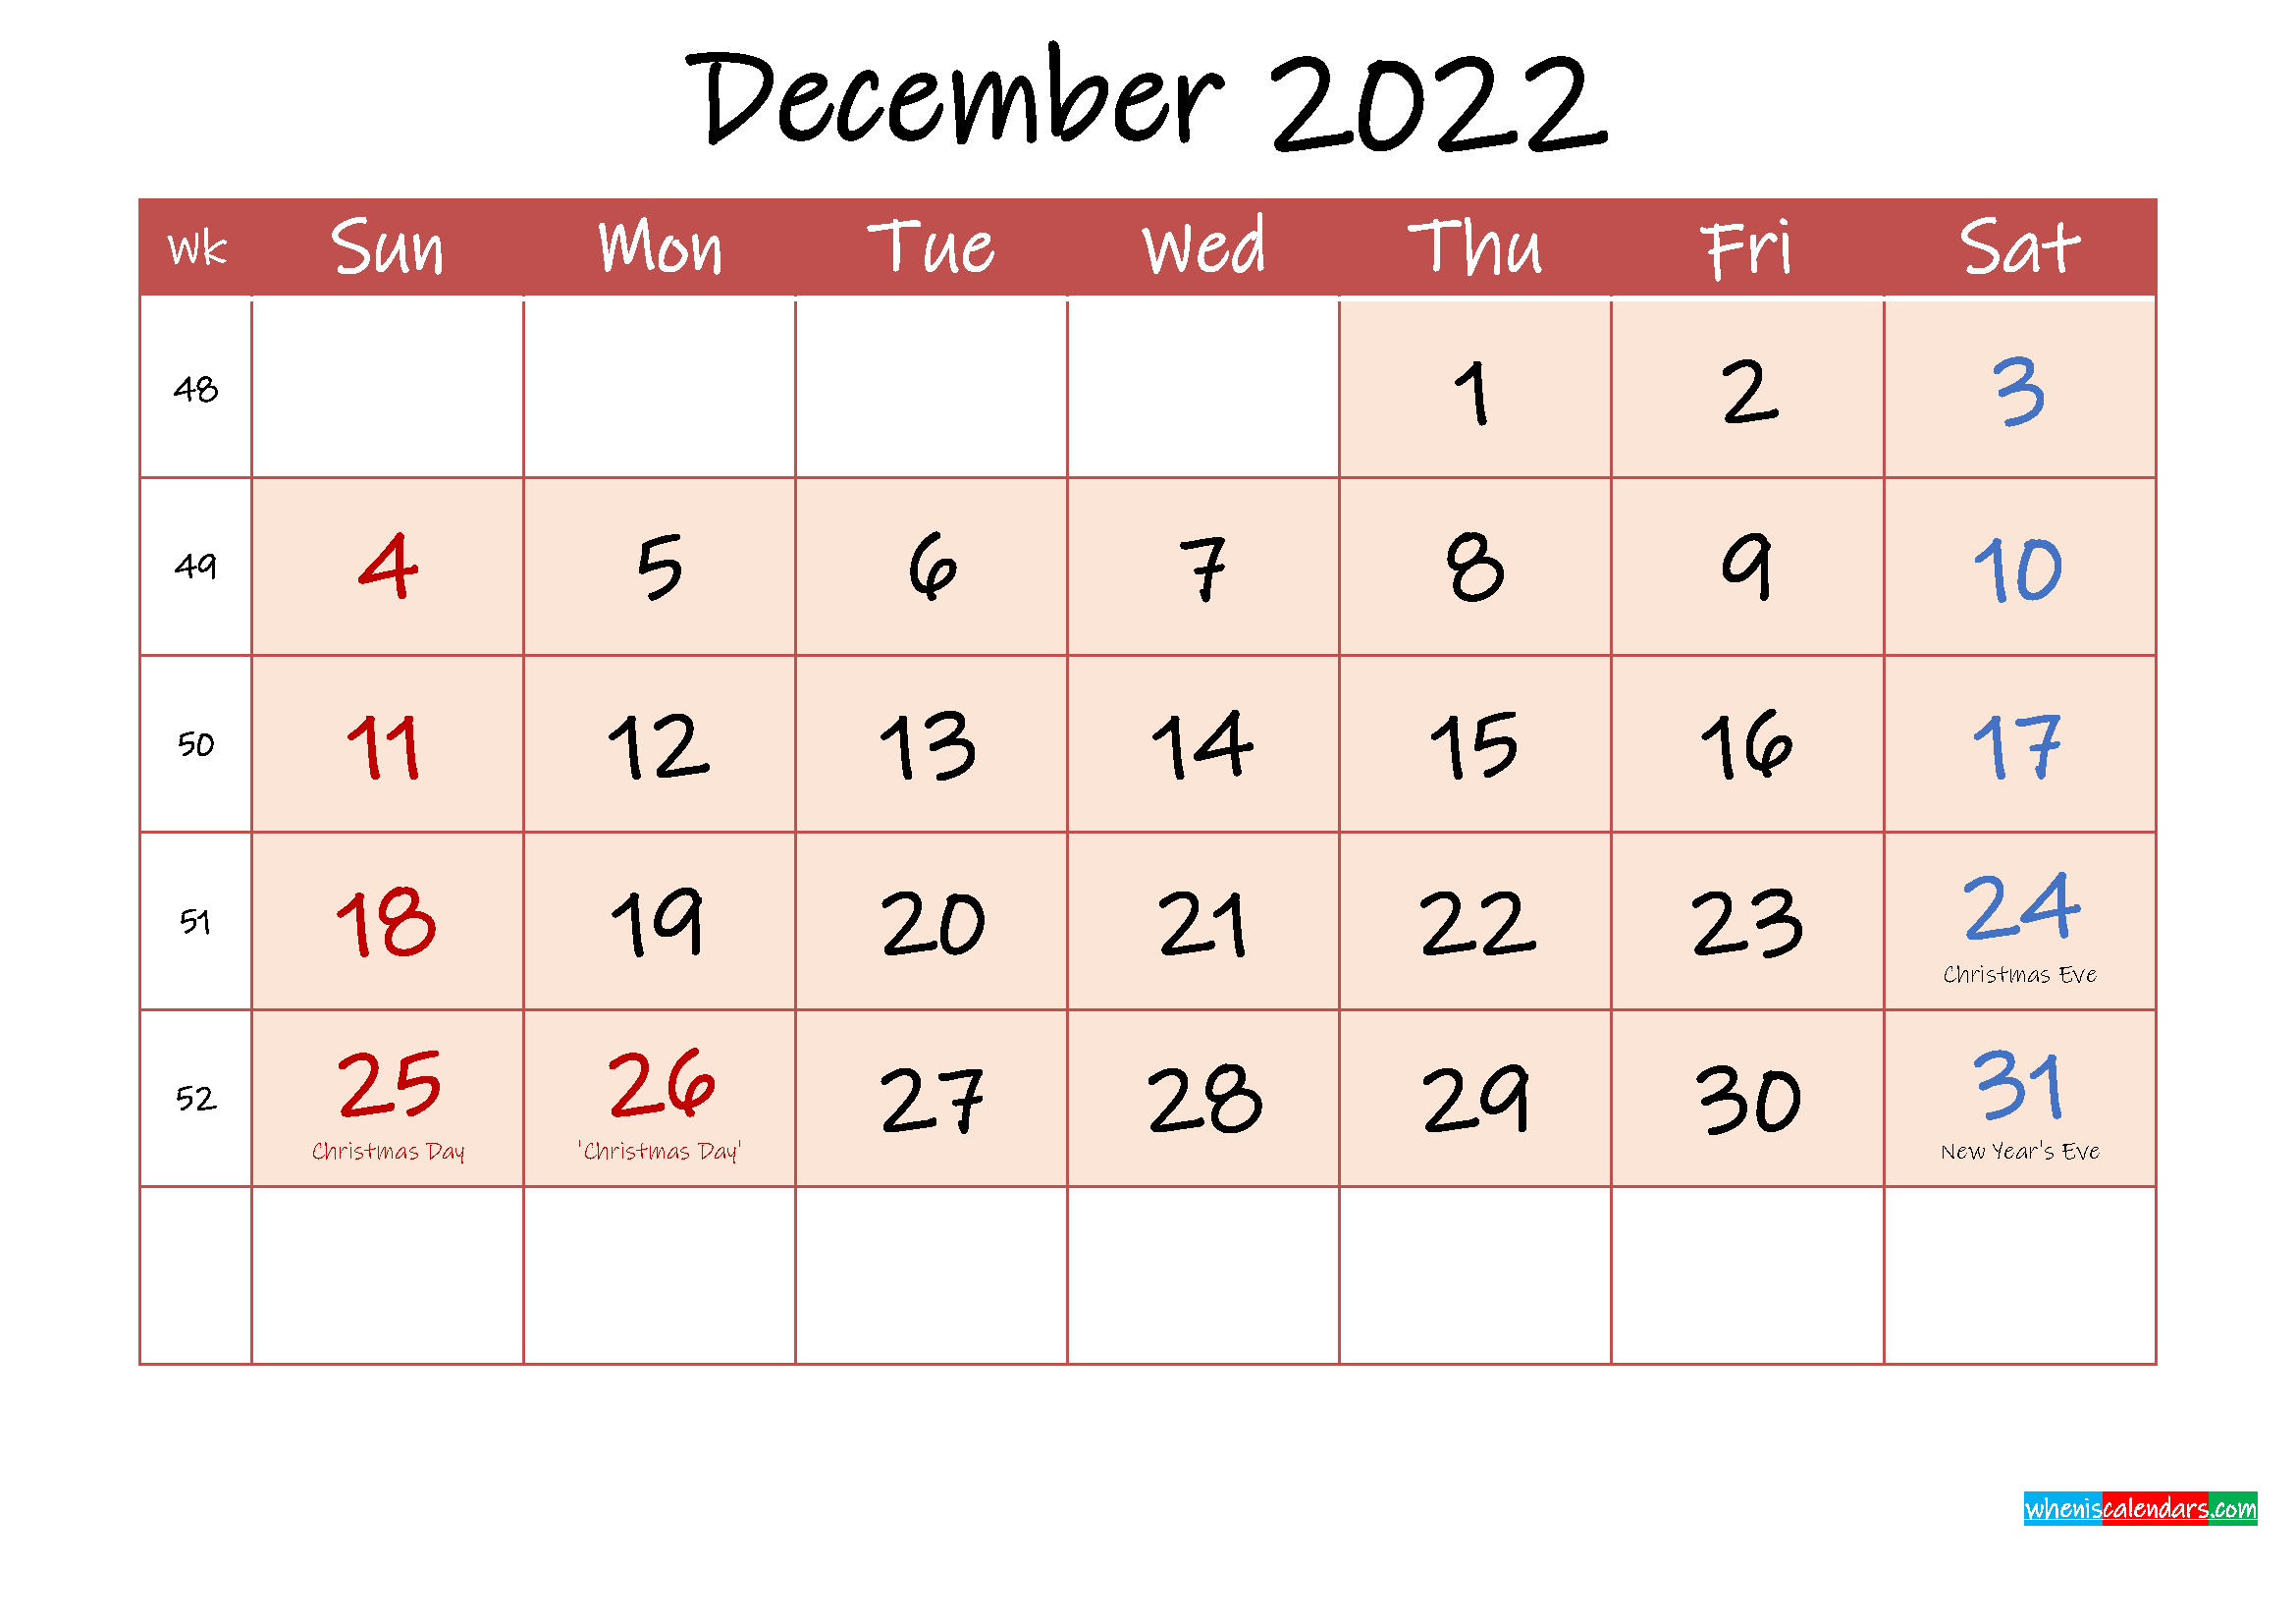 December 2022 Free Printable Calendar with Holidays